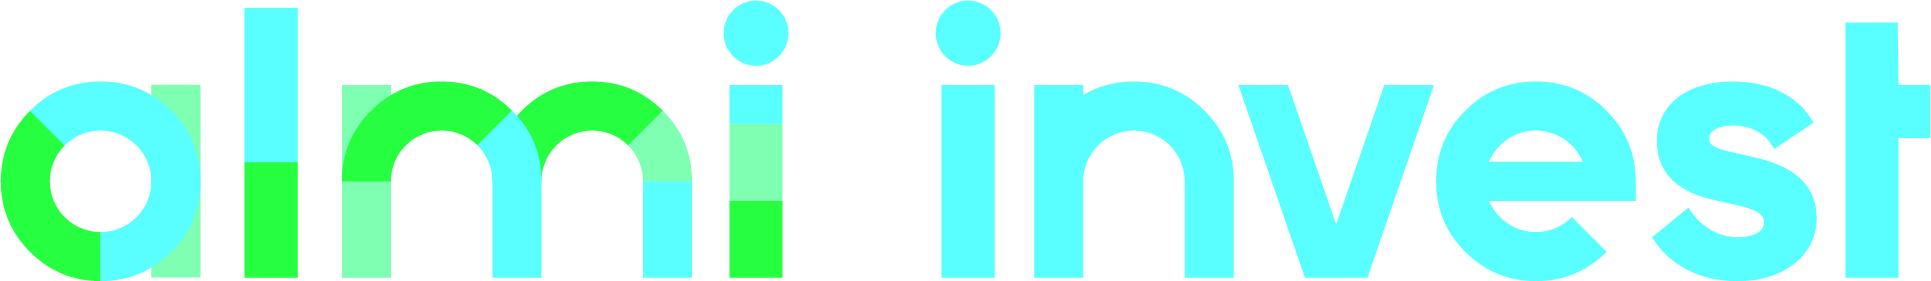 Almis pressrum - almi_logo_farg-02_rgb.jpg